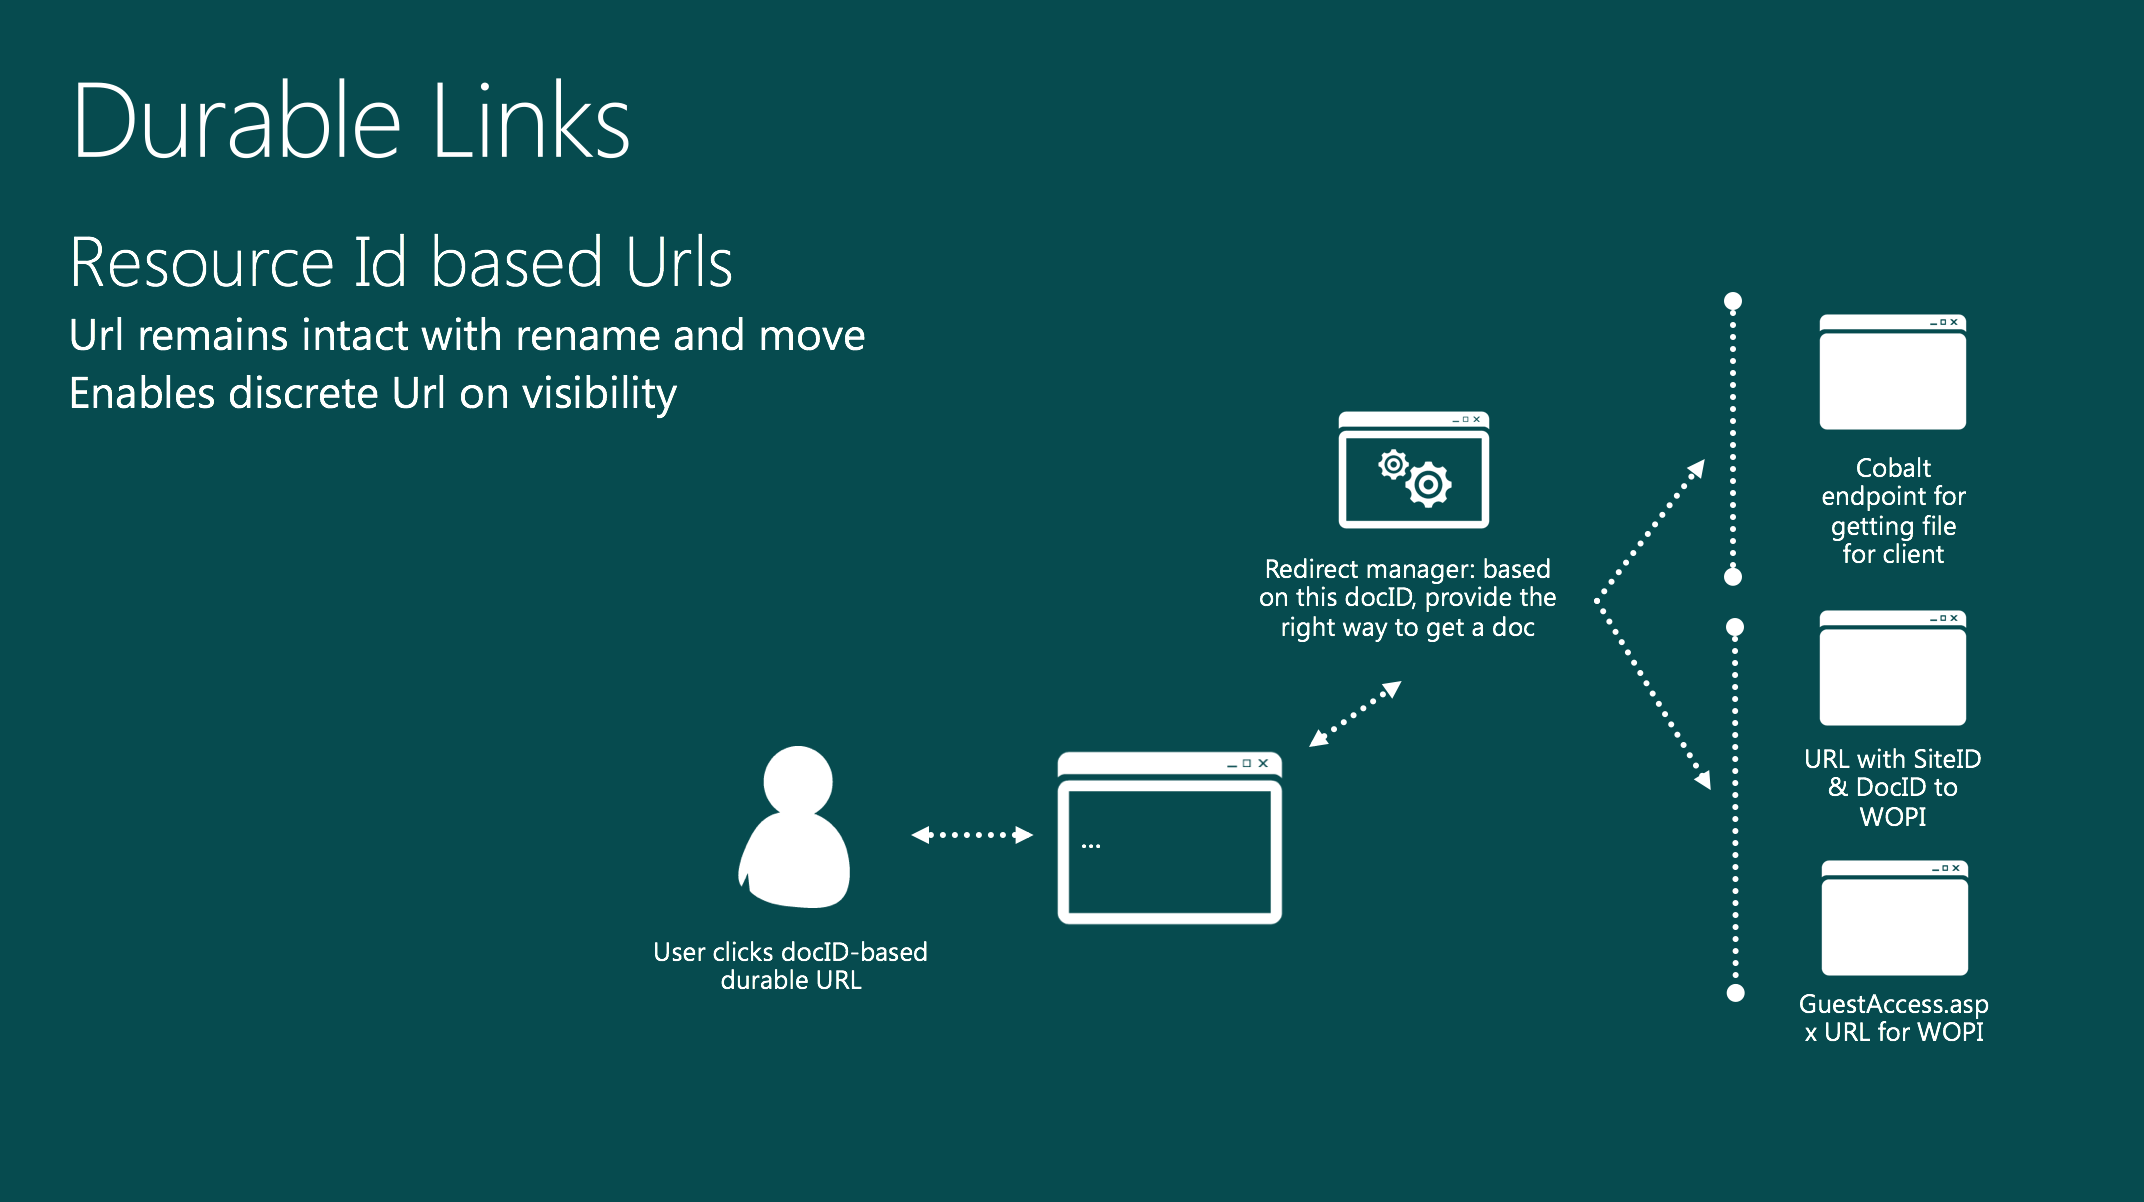 SharePoint 2016 Durable Links